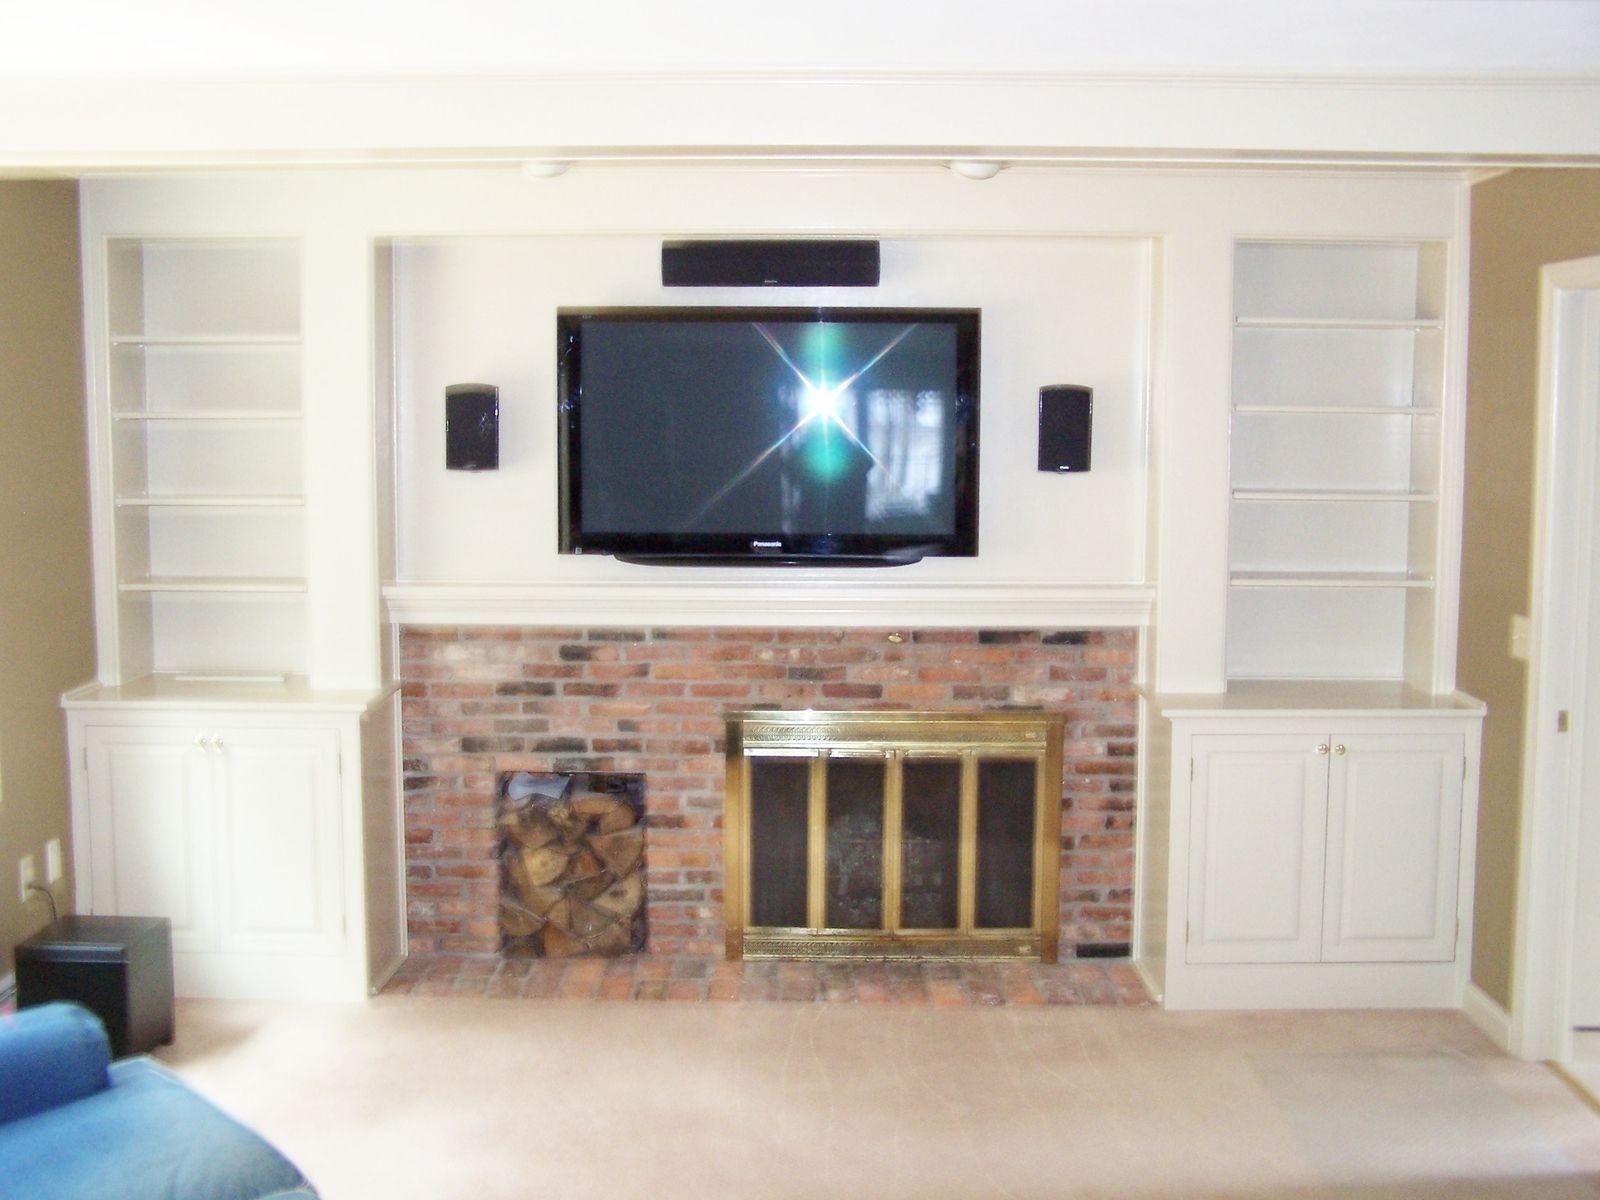 Custom Made Entertainment Center Around Fireplace | Decorating ideas ...